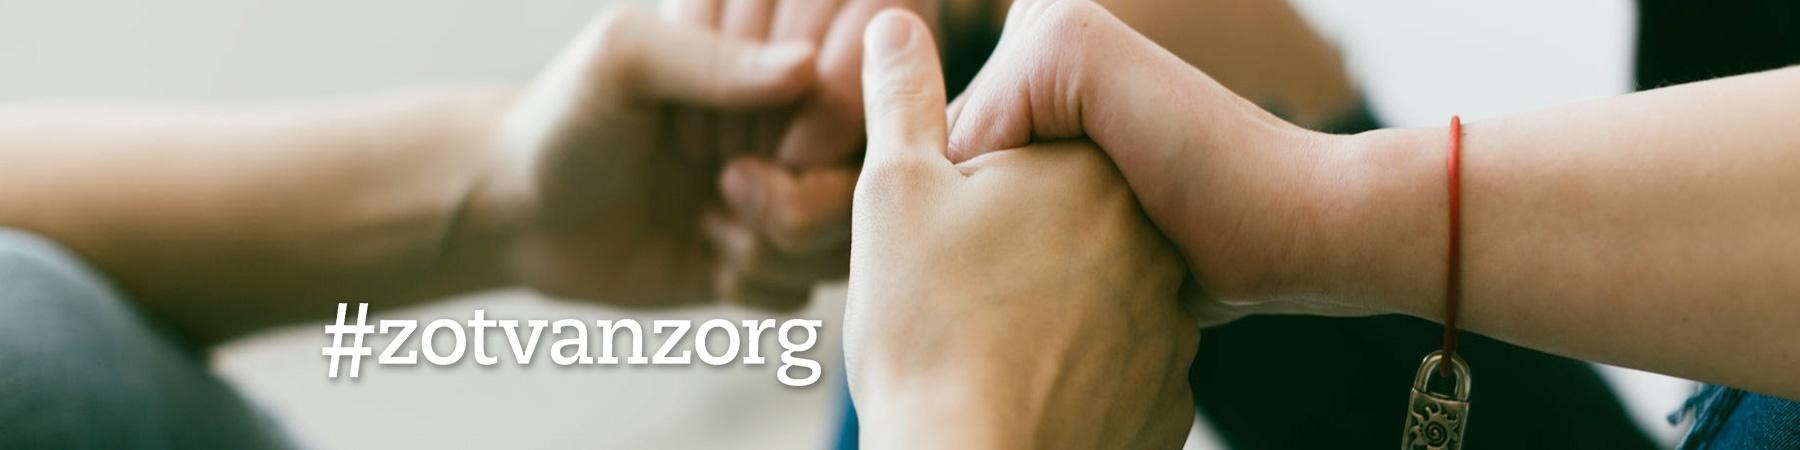 zotvanzorg_website_1_7.jpg